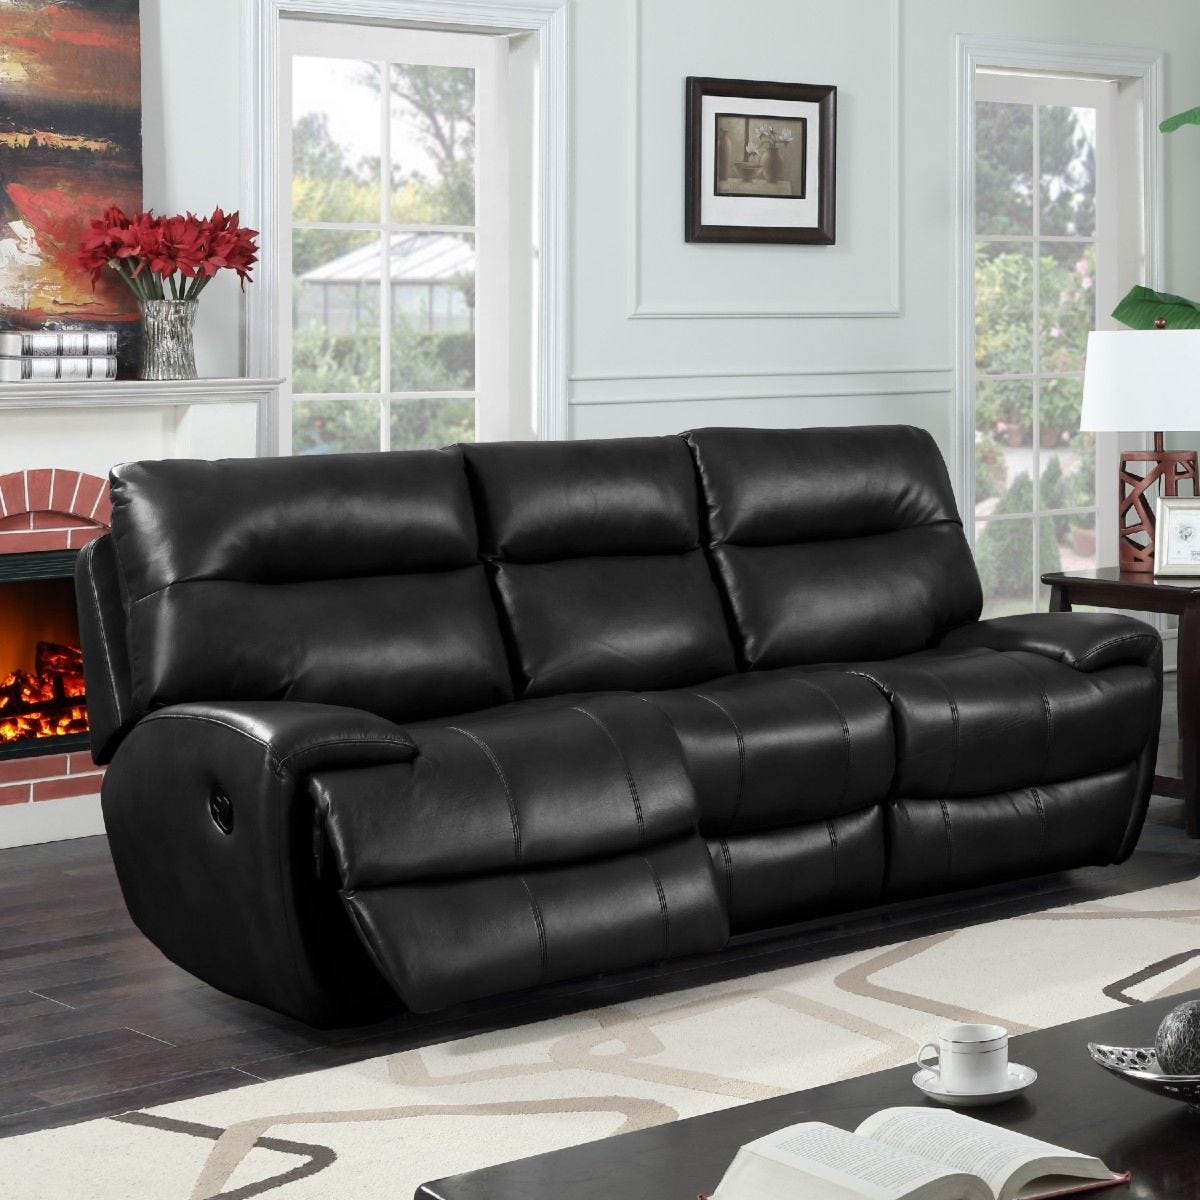 Bampton Recliner 3 Seater Faux Leather Sofa Black